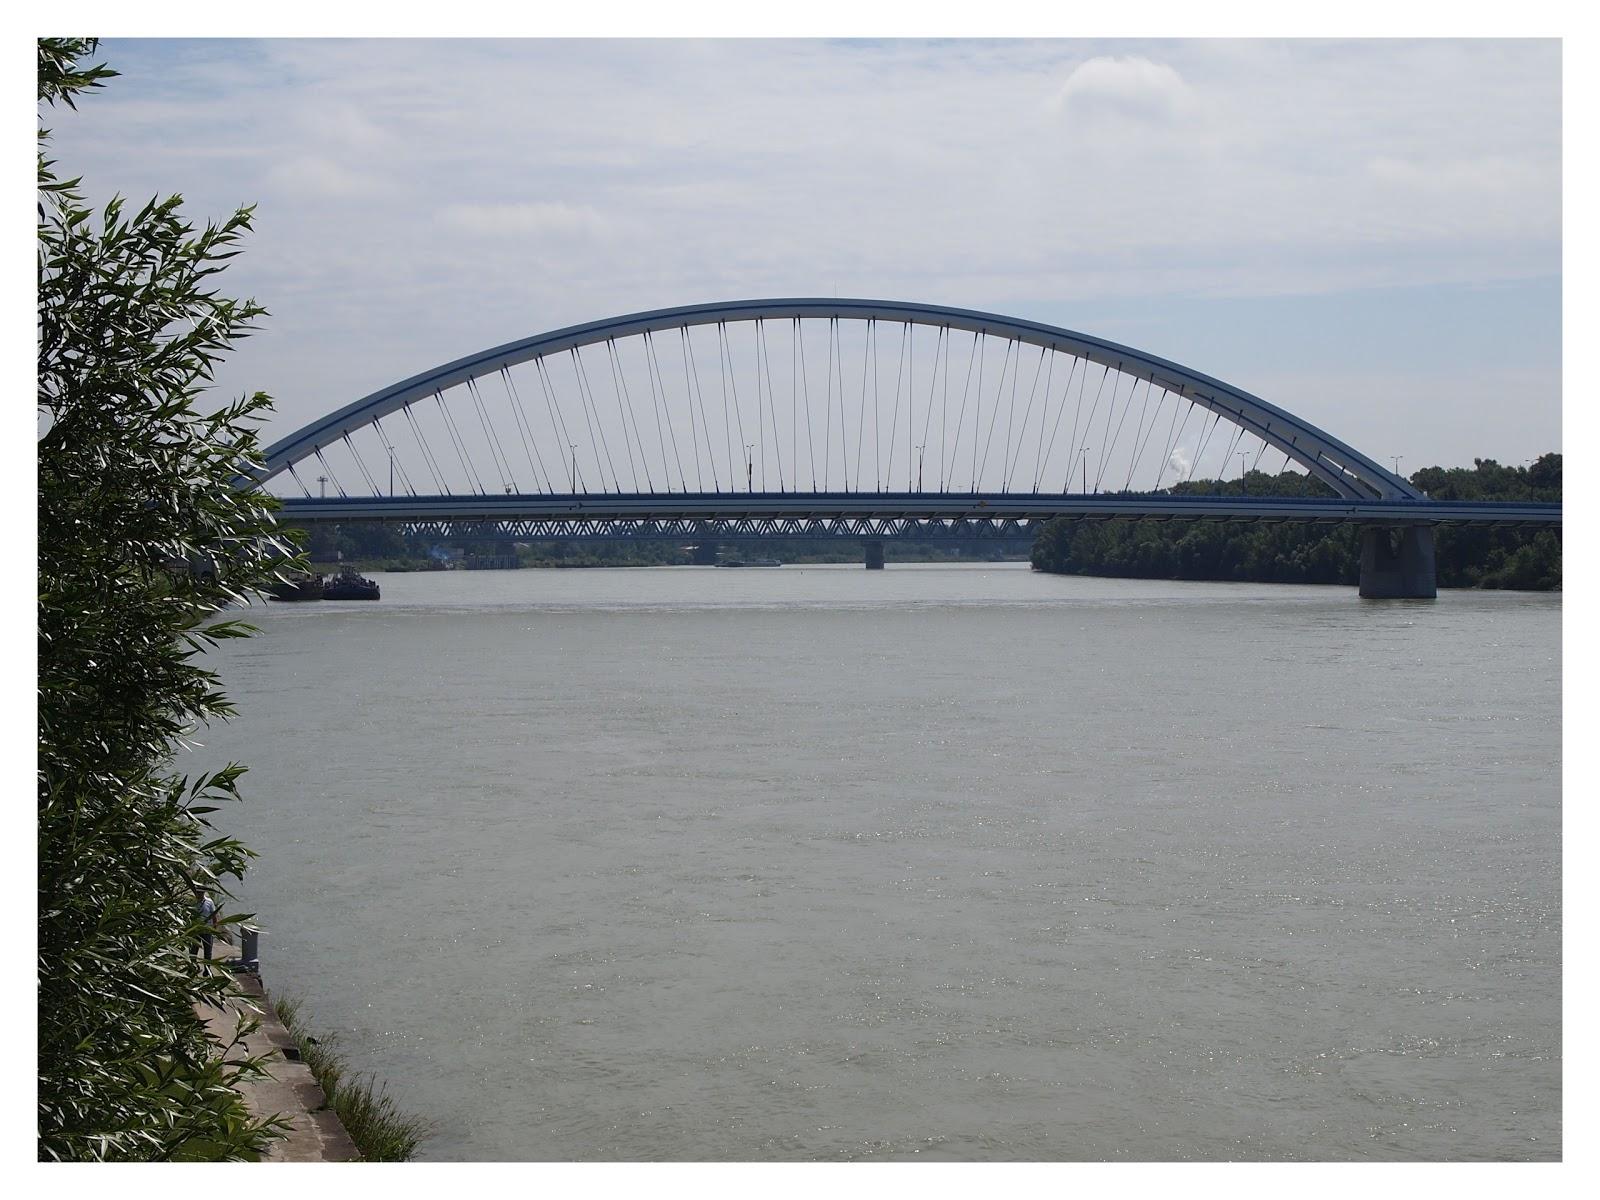 In Bratislava on summer 2012